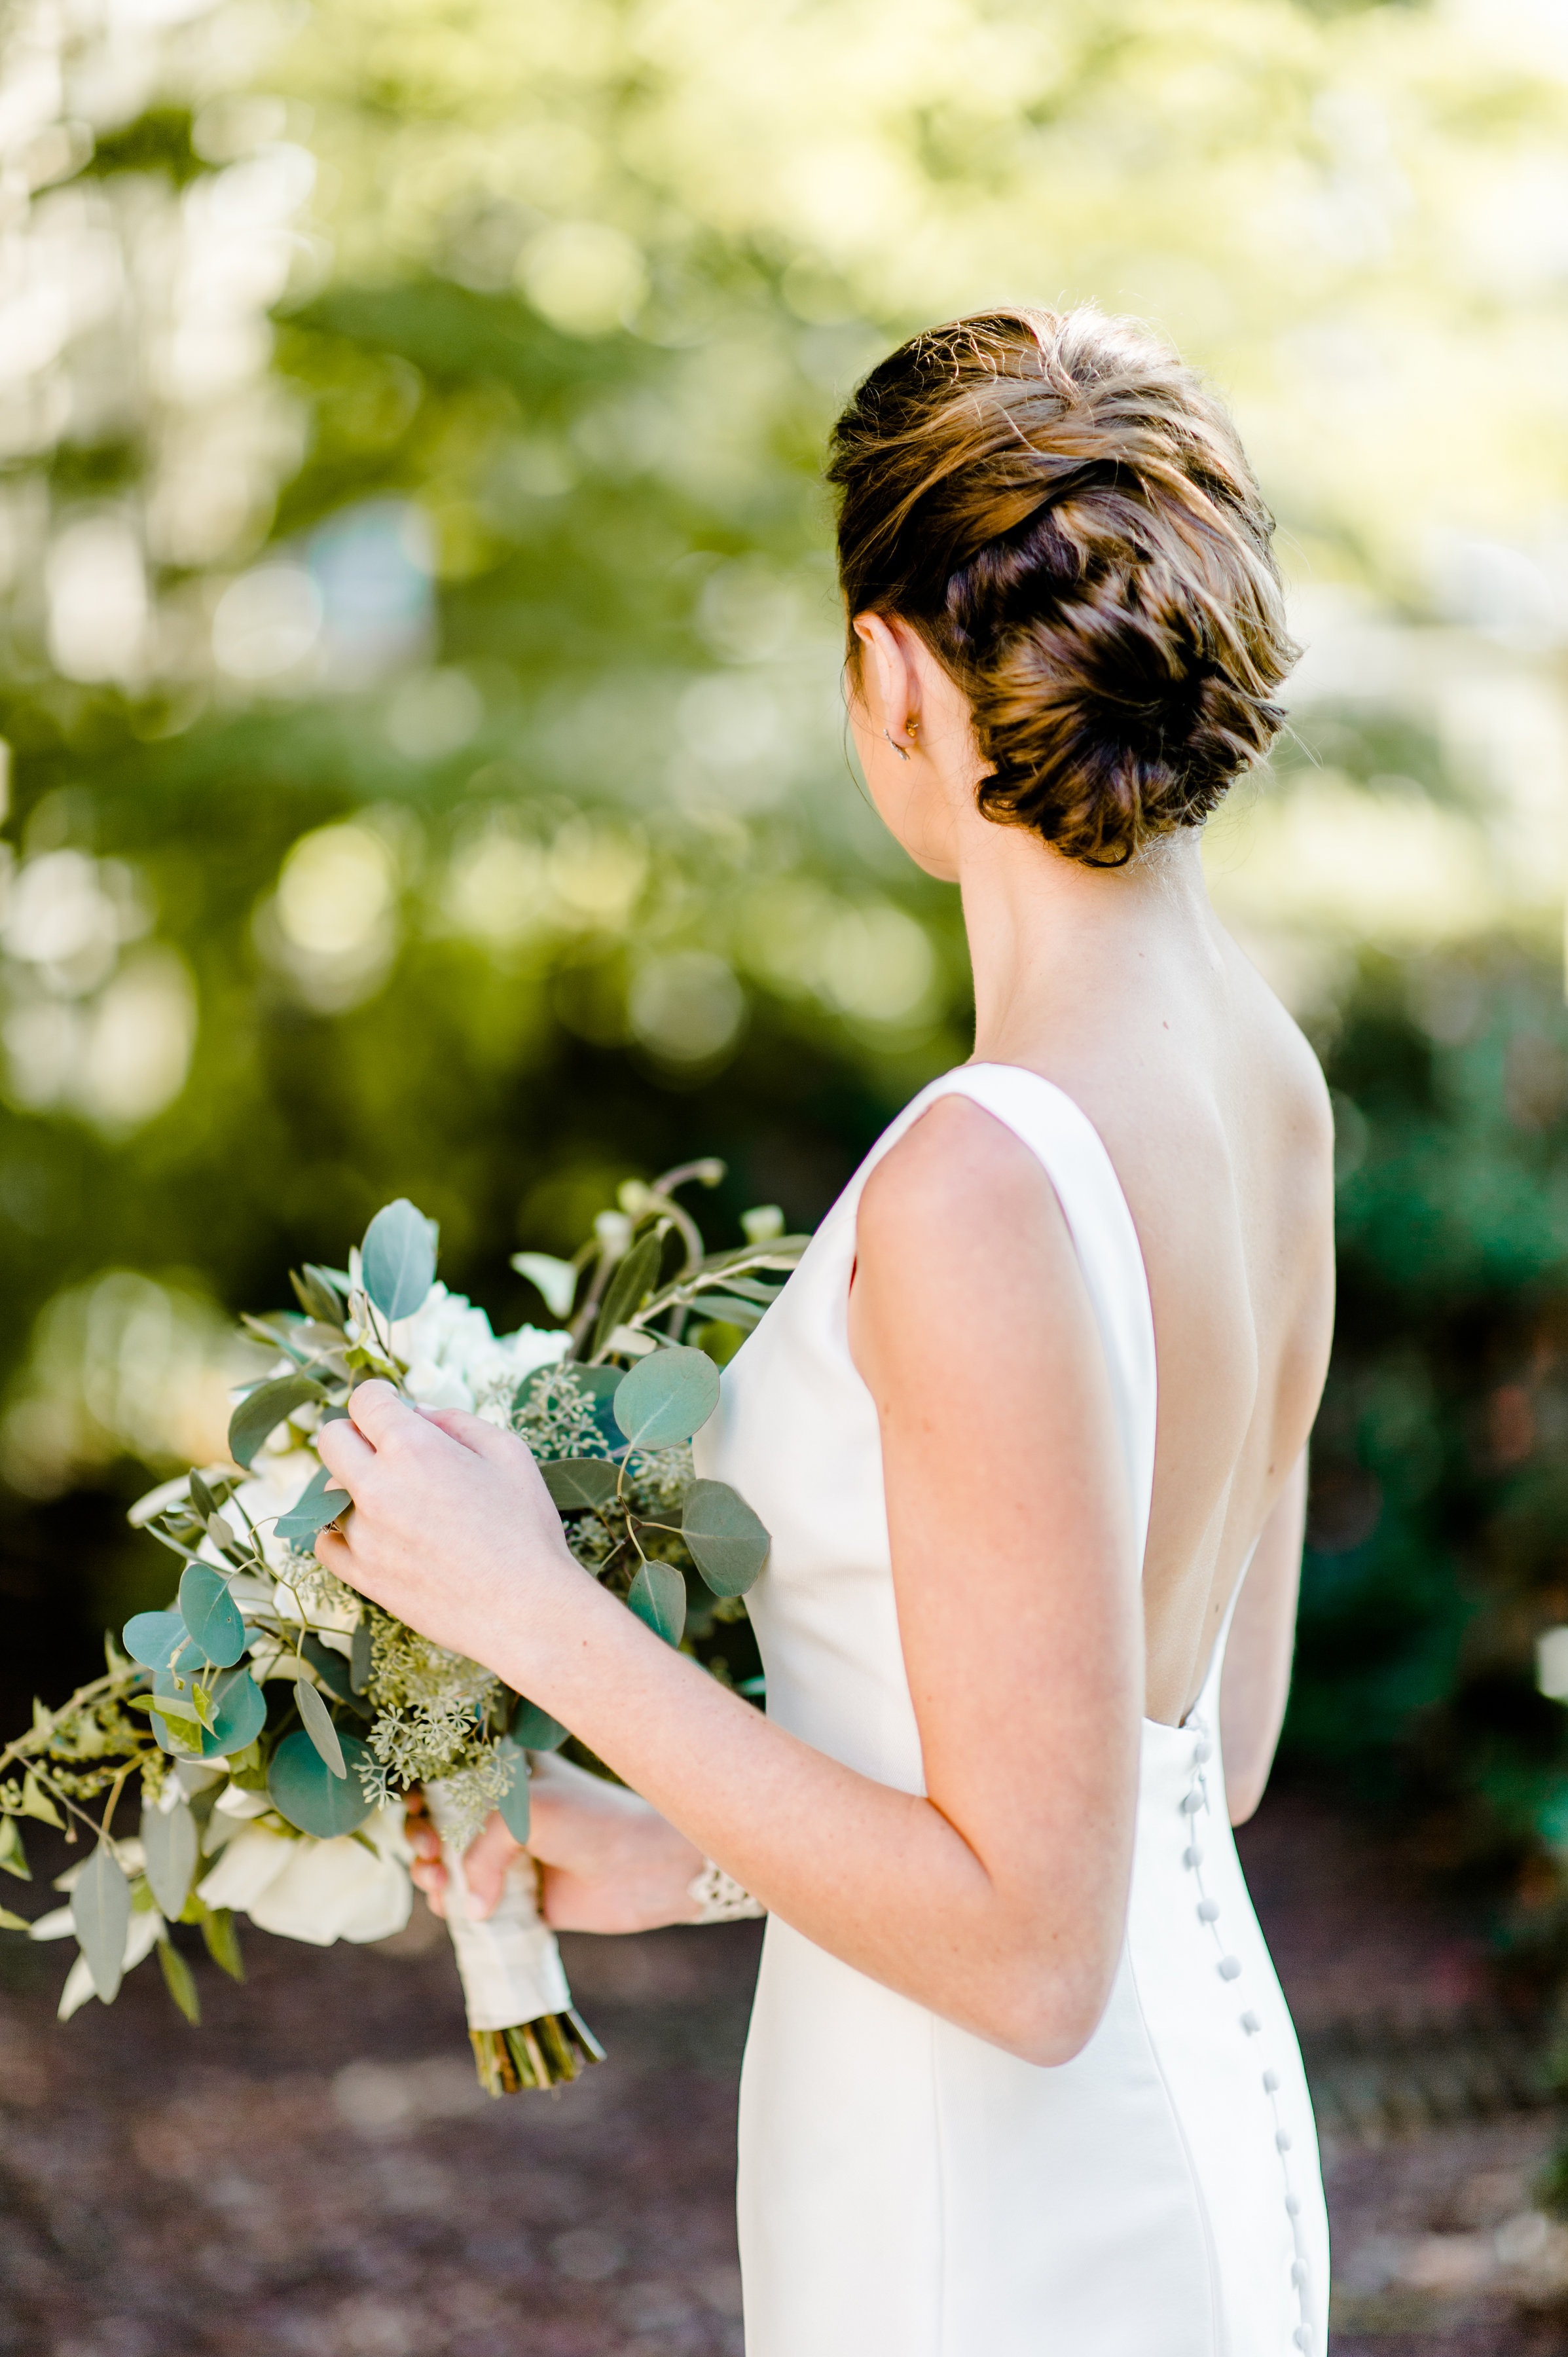 CarolineLimaPhotography_Owens_Wedding_2017_124.jpg